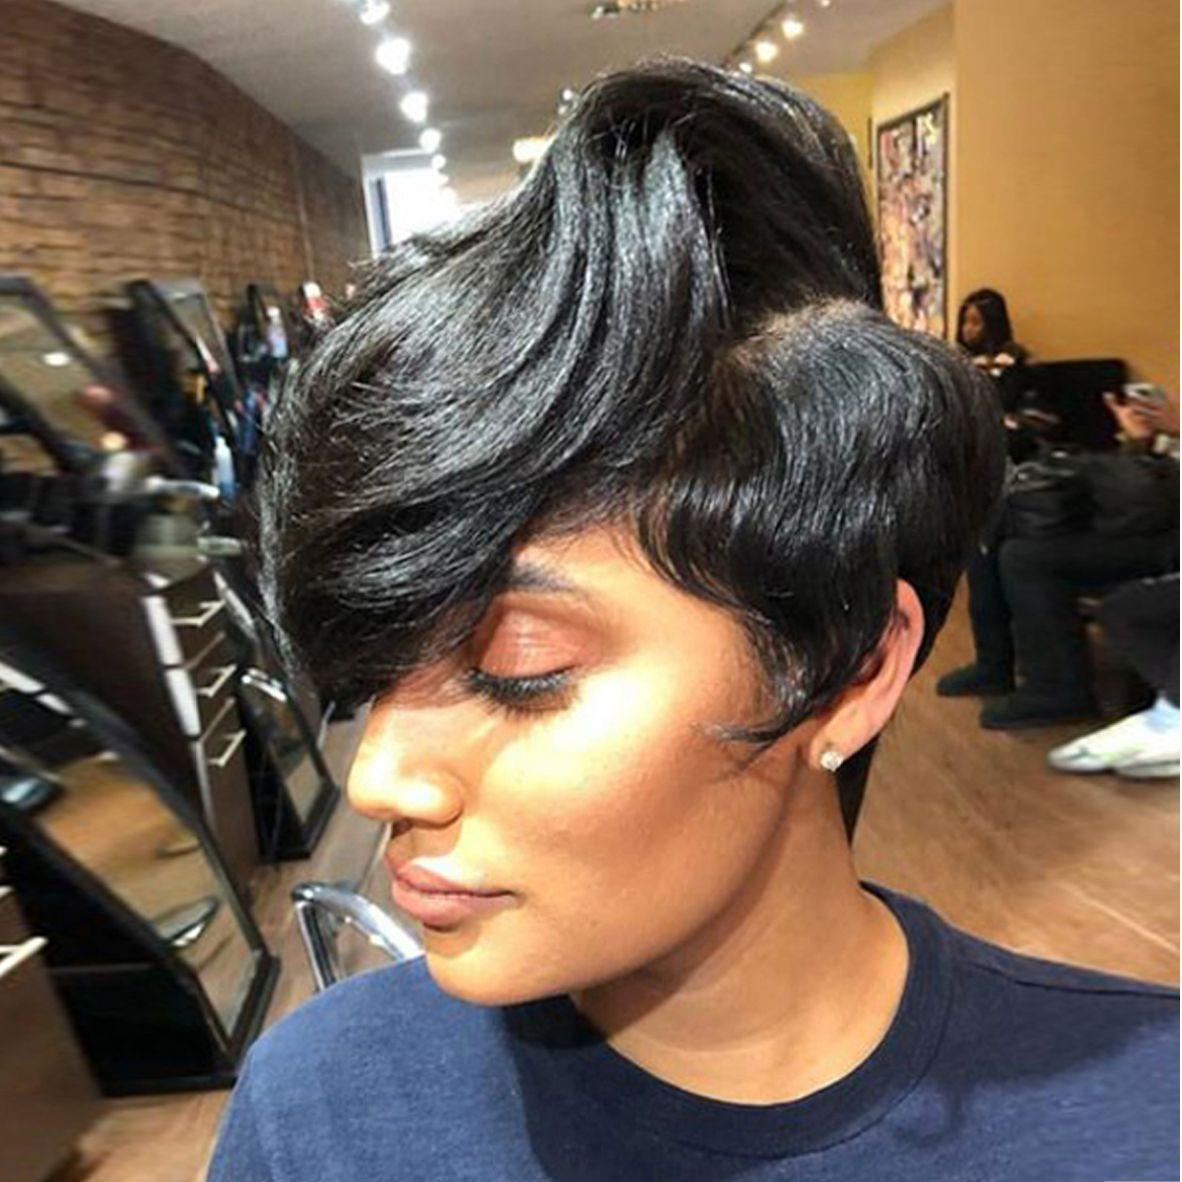 New York Designer Bob Wigs Gbw090 19 86 Hair Styles Weave Hairstyles Short Weave Hairstyles